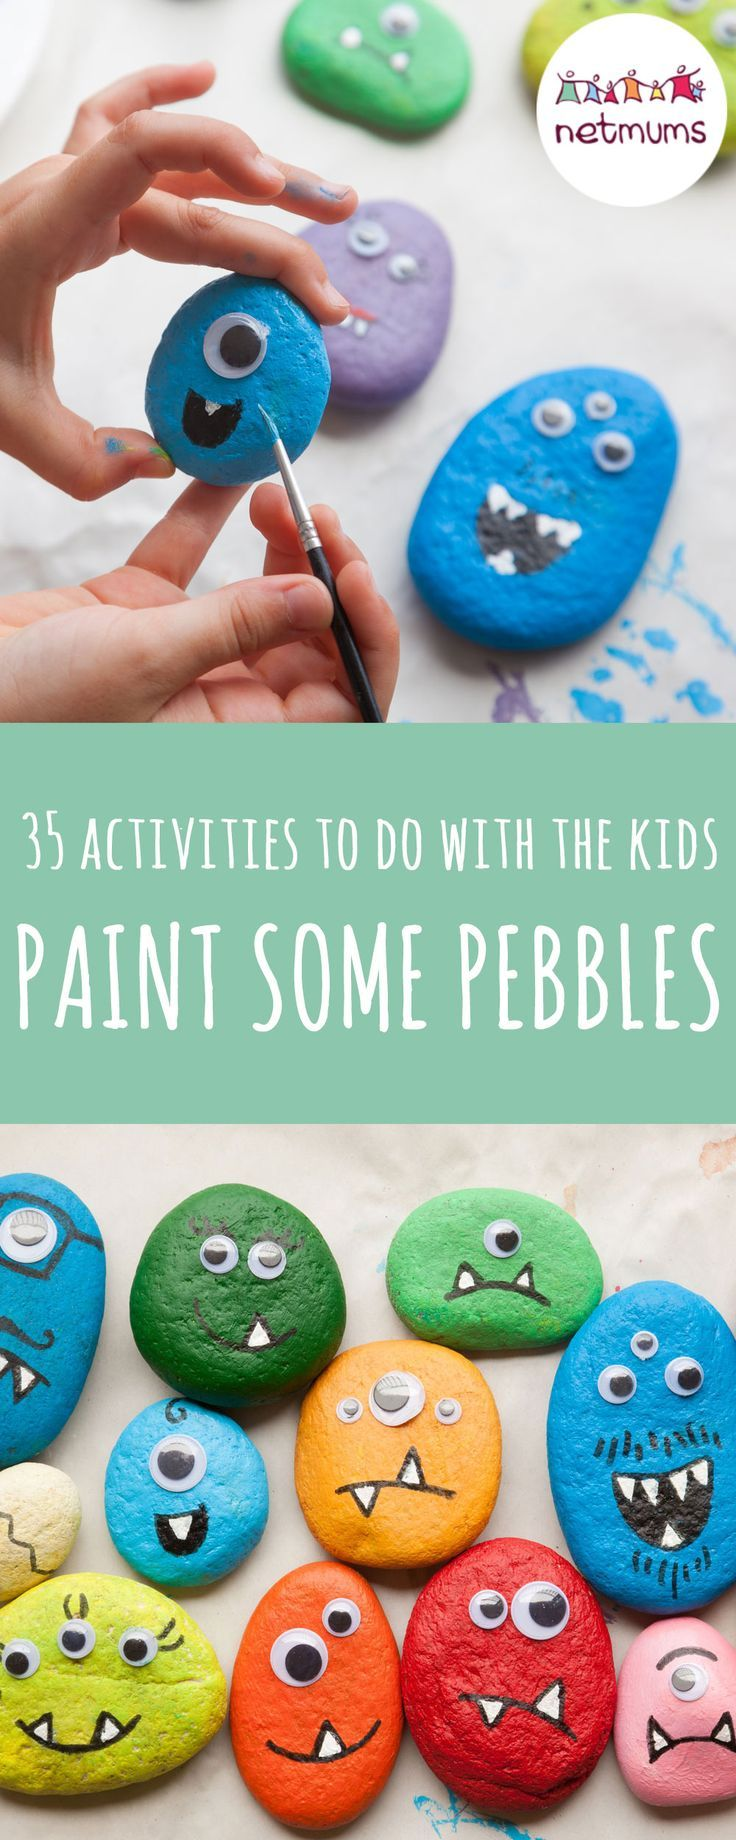 100 activities if you're stuck indoors with kids